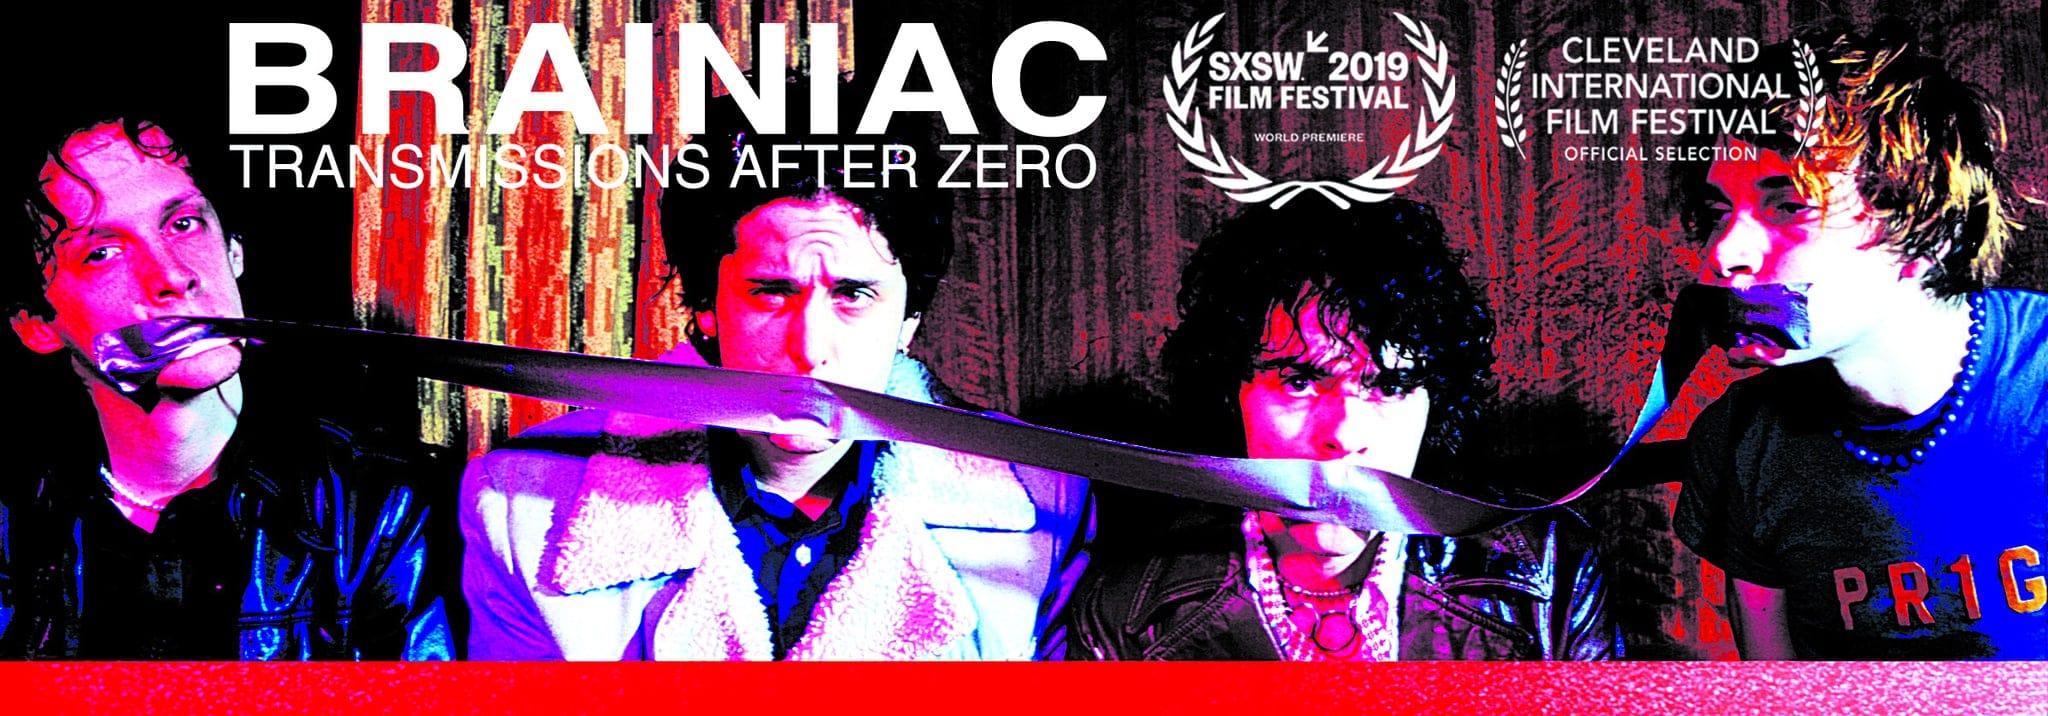 Poster Courtesy Brainiac: Transmissions After Zero